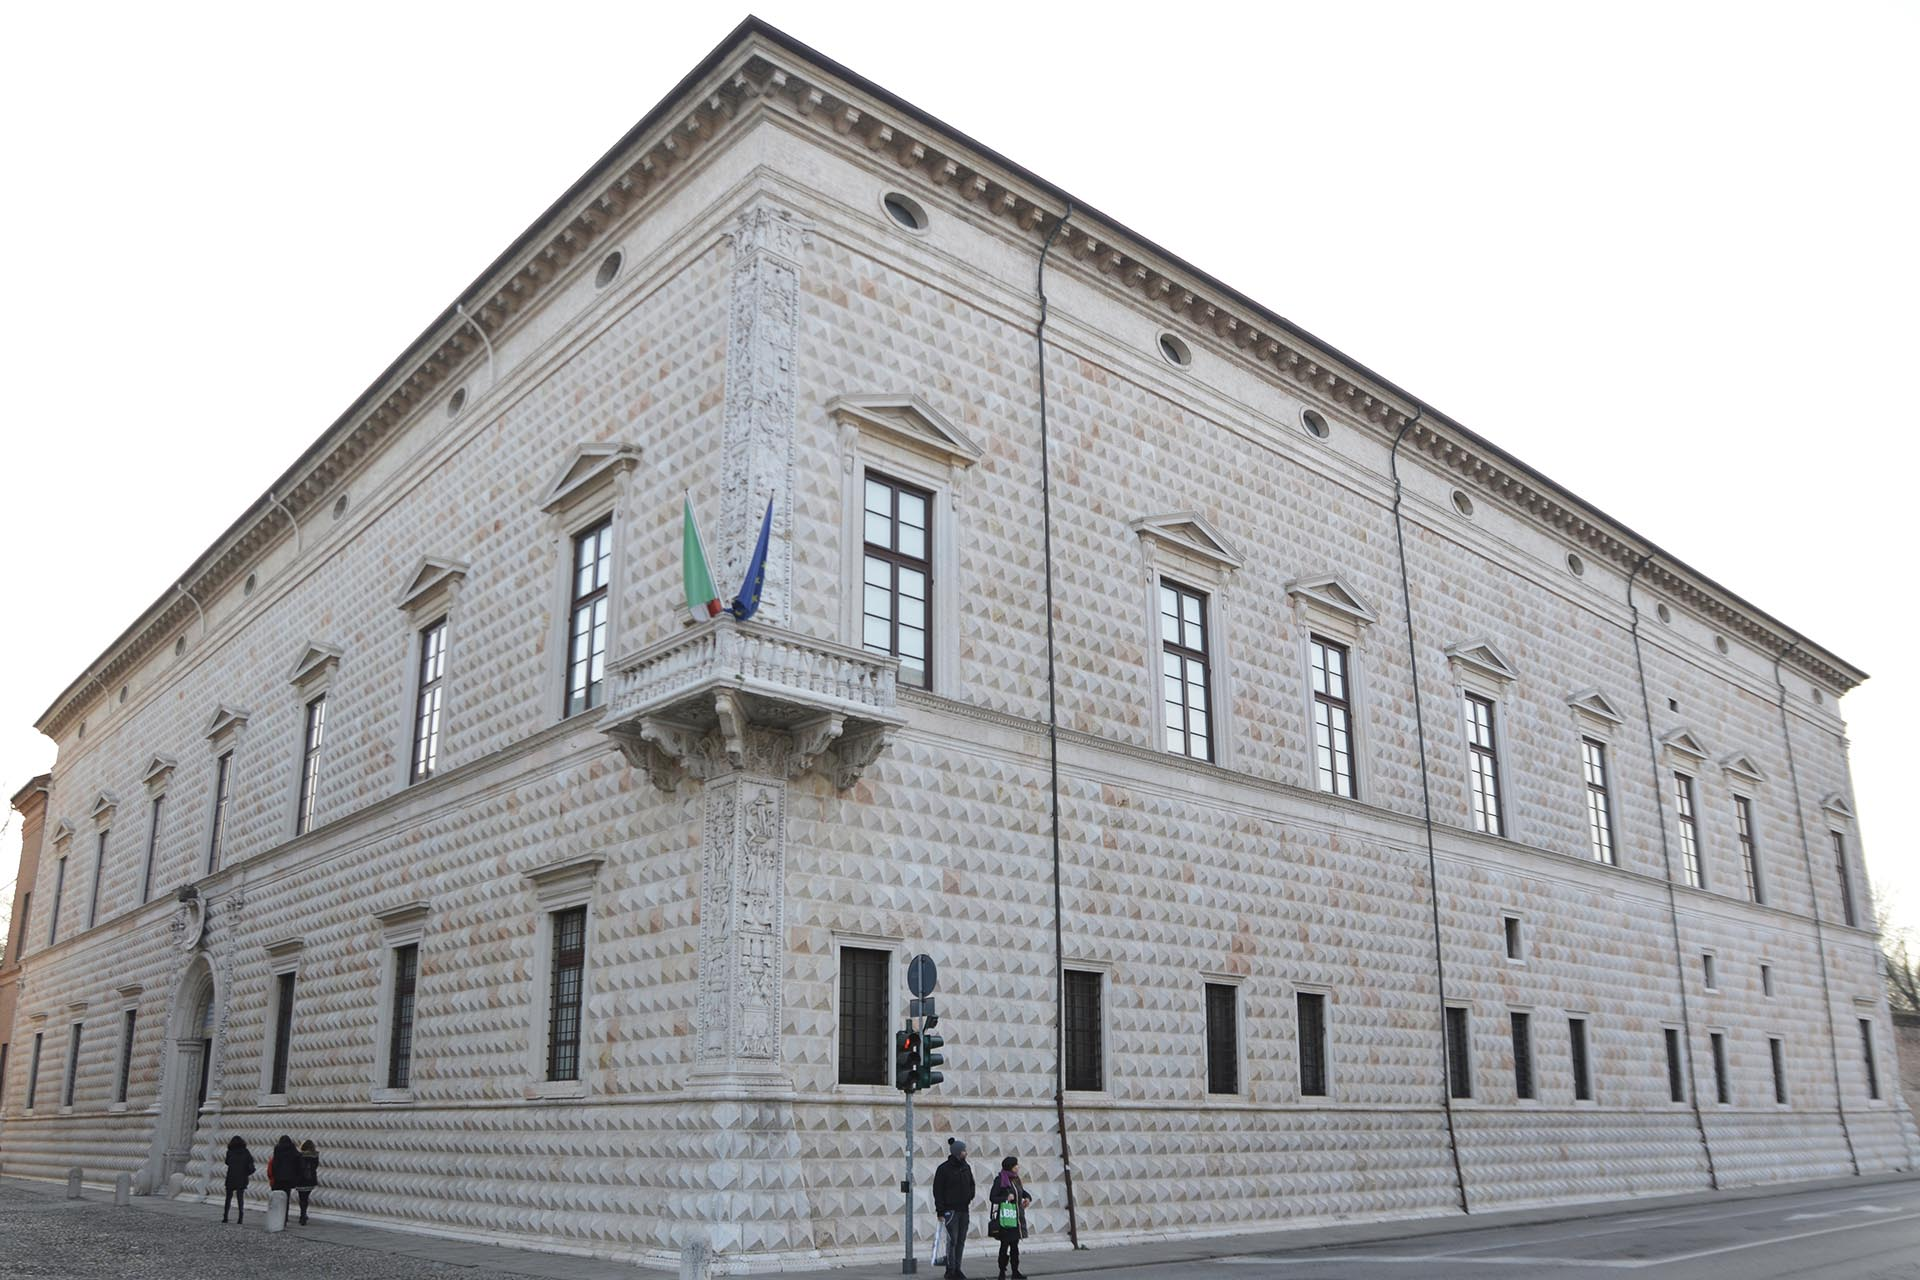 Ferrara - Palazzo dei Diamanti